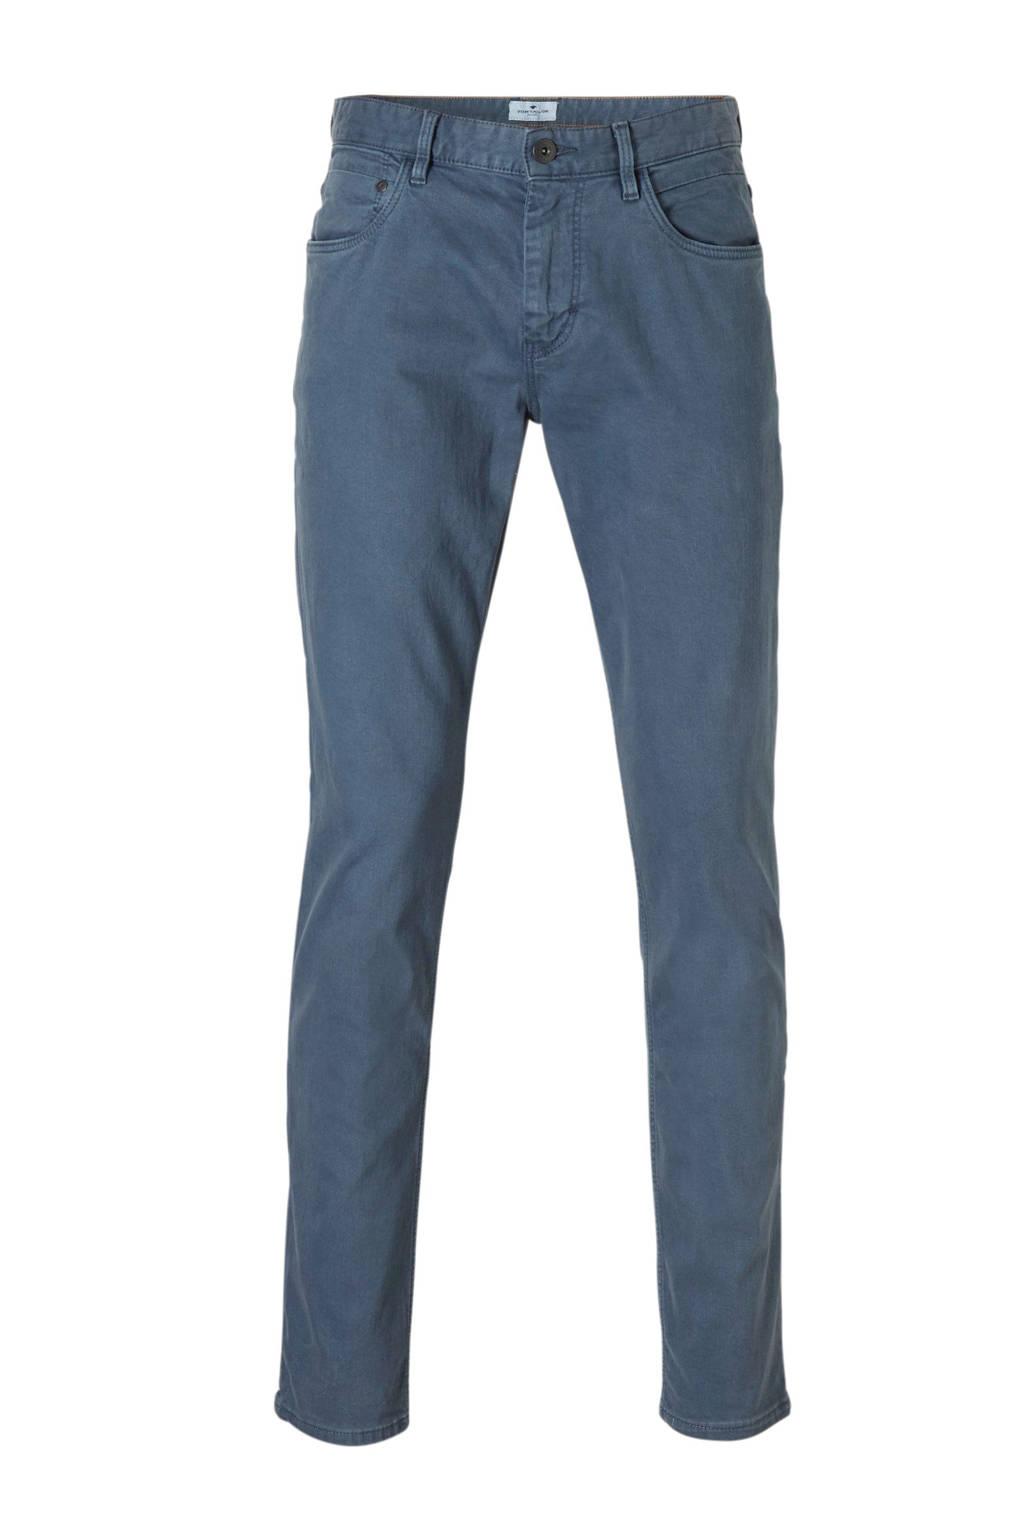 Tom Tailor slim fit jeans blauw, Blauw